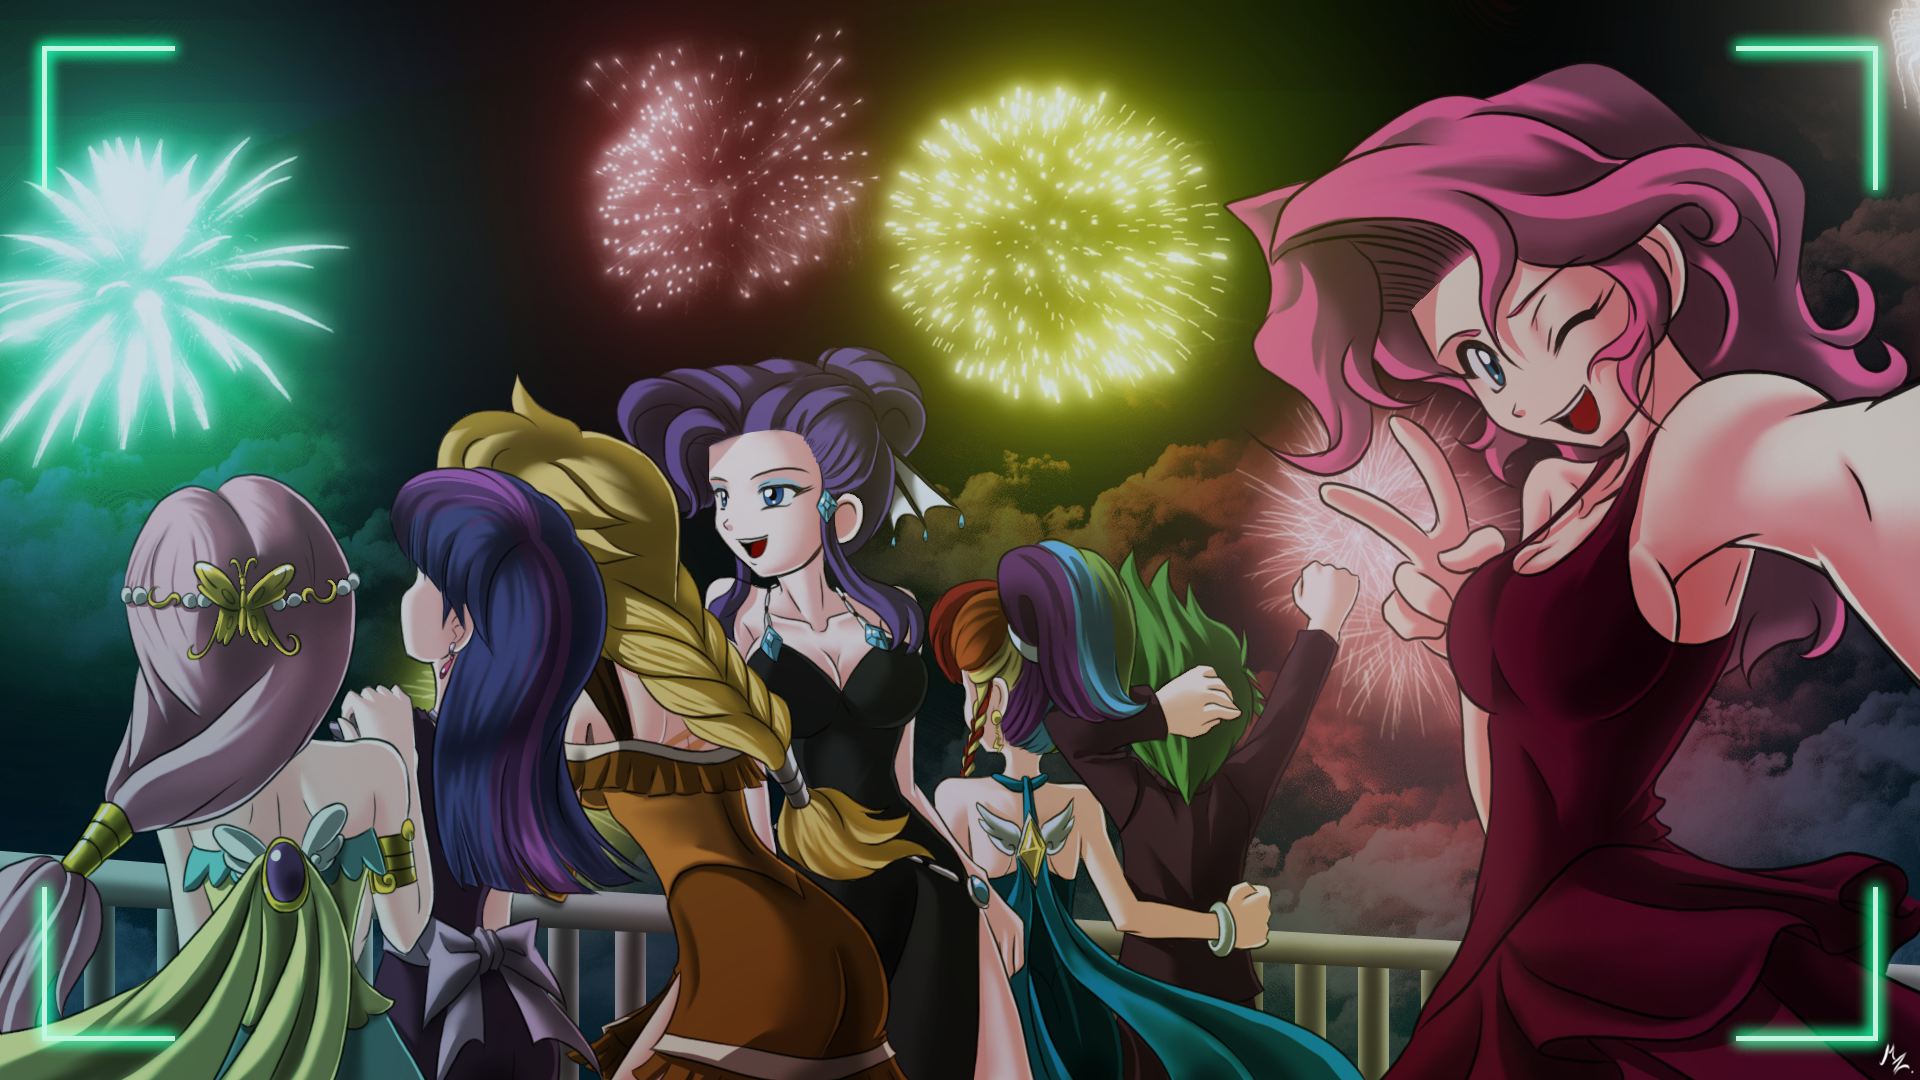 My little pony equestria girls friendship games blind reaction 183 5